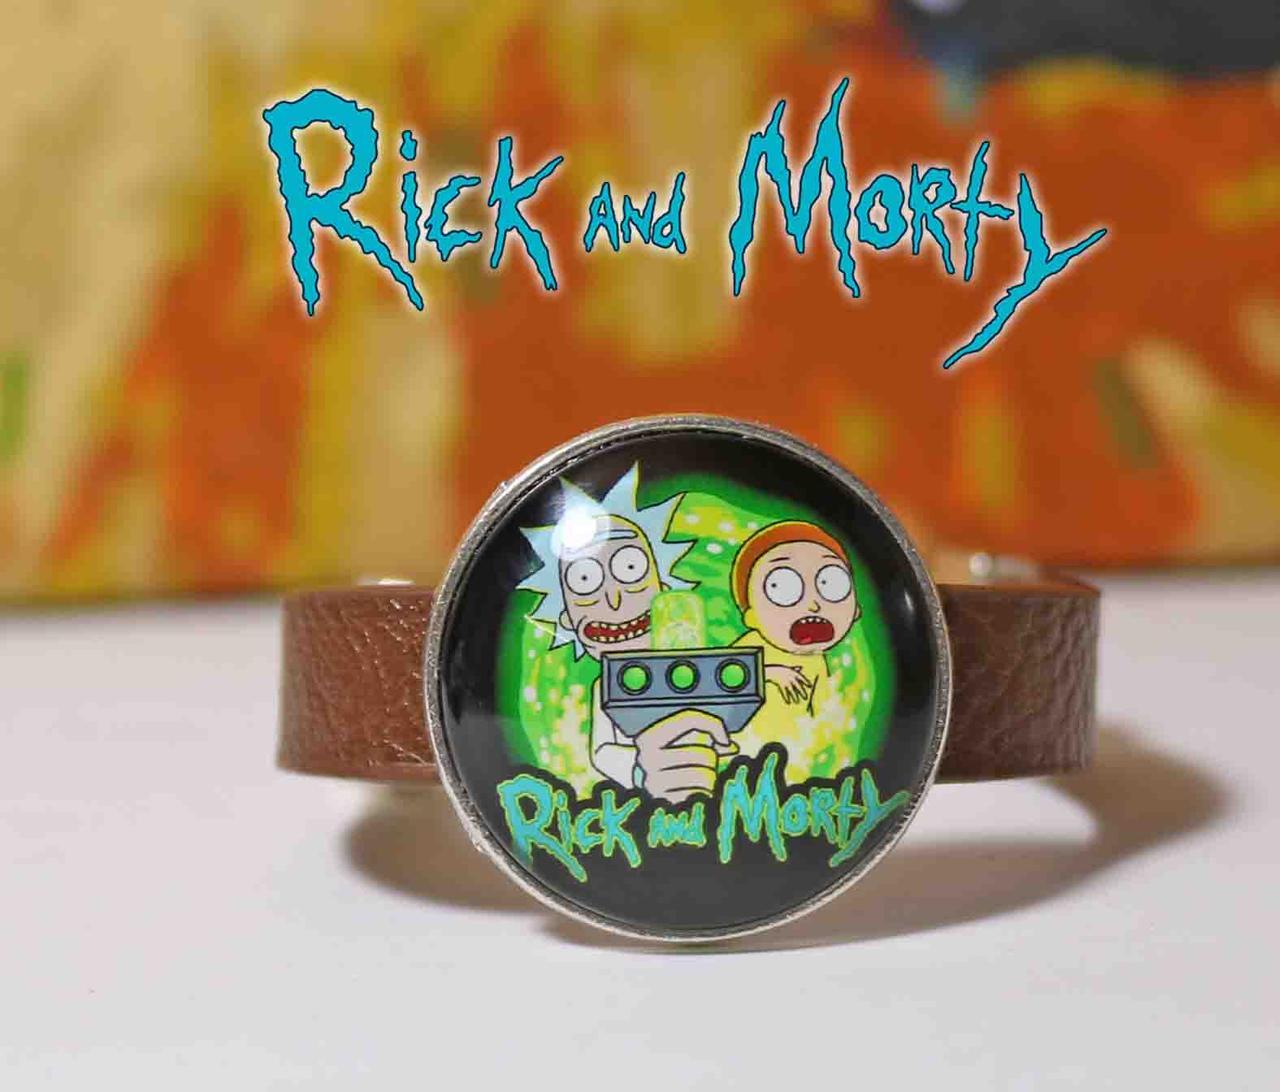 Браслет Rick and Morty Рик и Морти / Rick and Morty